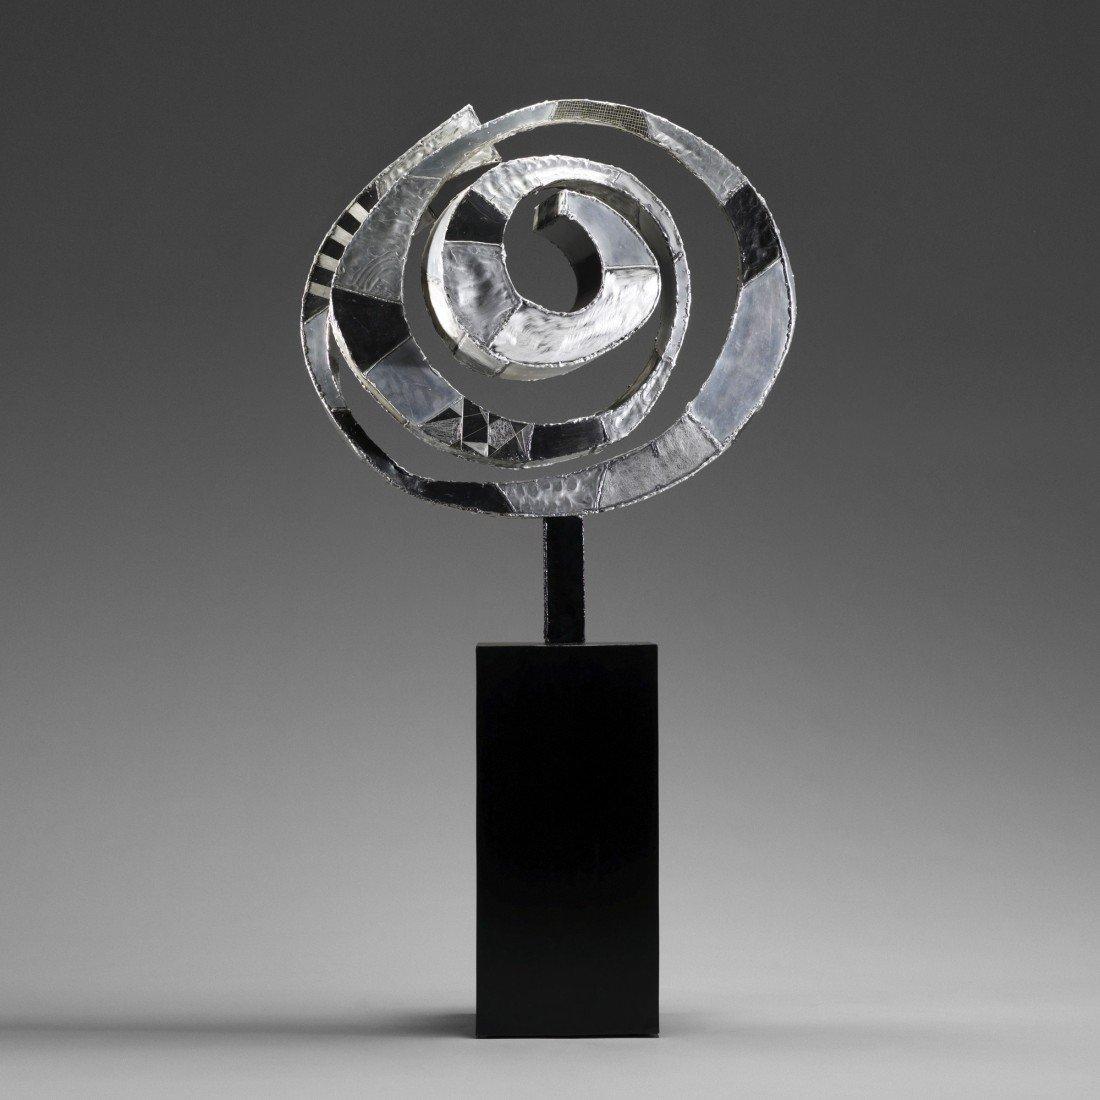 117: Paul Evans Argente Pinwheel sculpture